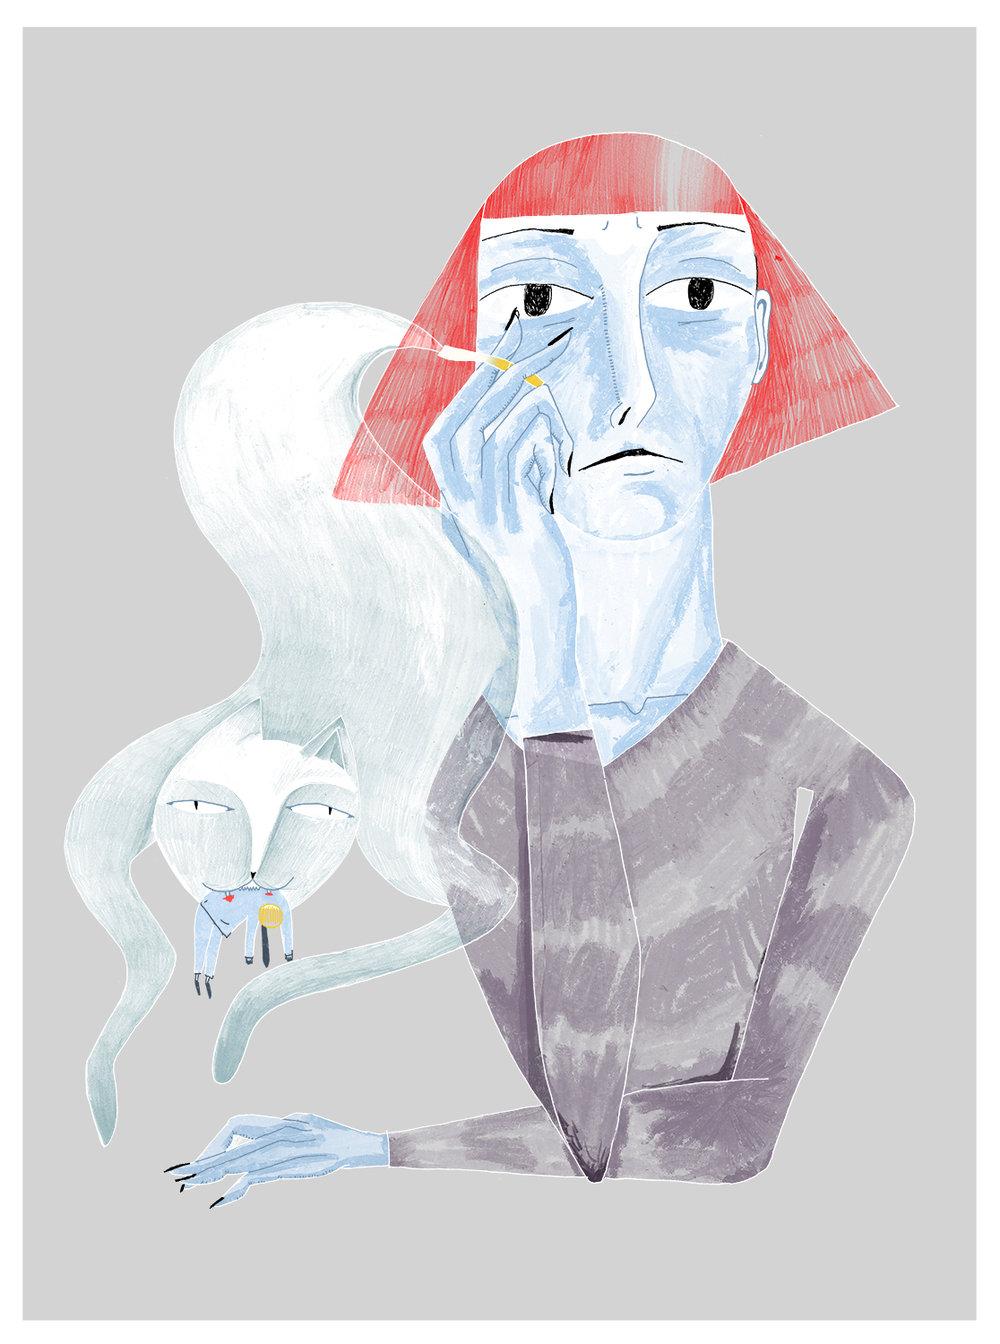 personal illustration; 2018; shown in red bull house of art, detroit, MI